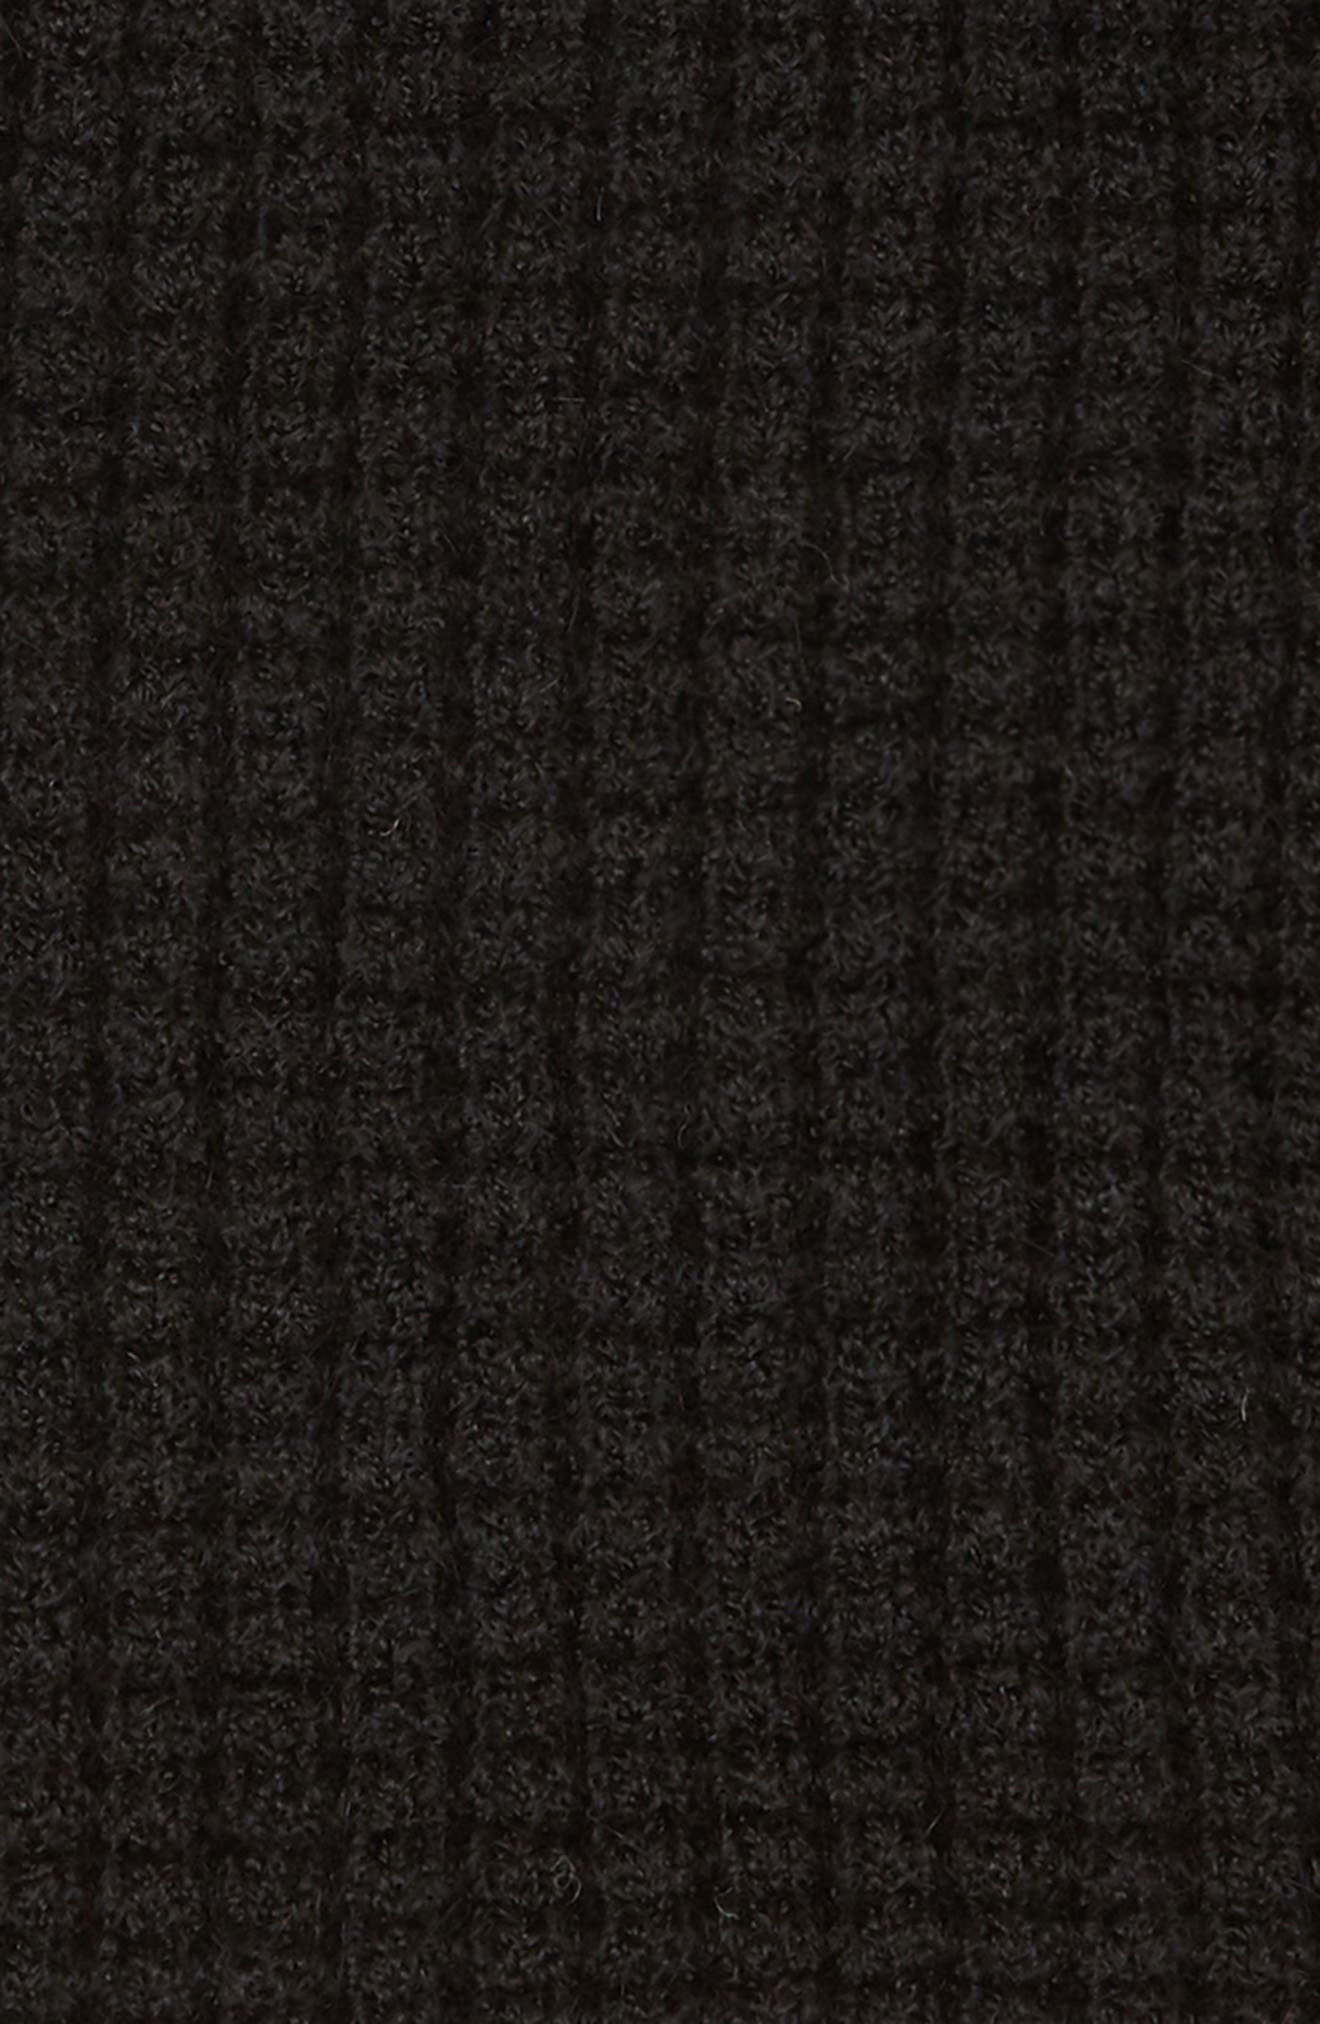 Tiffany Baby Alpaca Infinity Scarf,                             Alternate thumbnail 4, color,                             BLACK